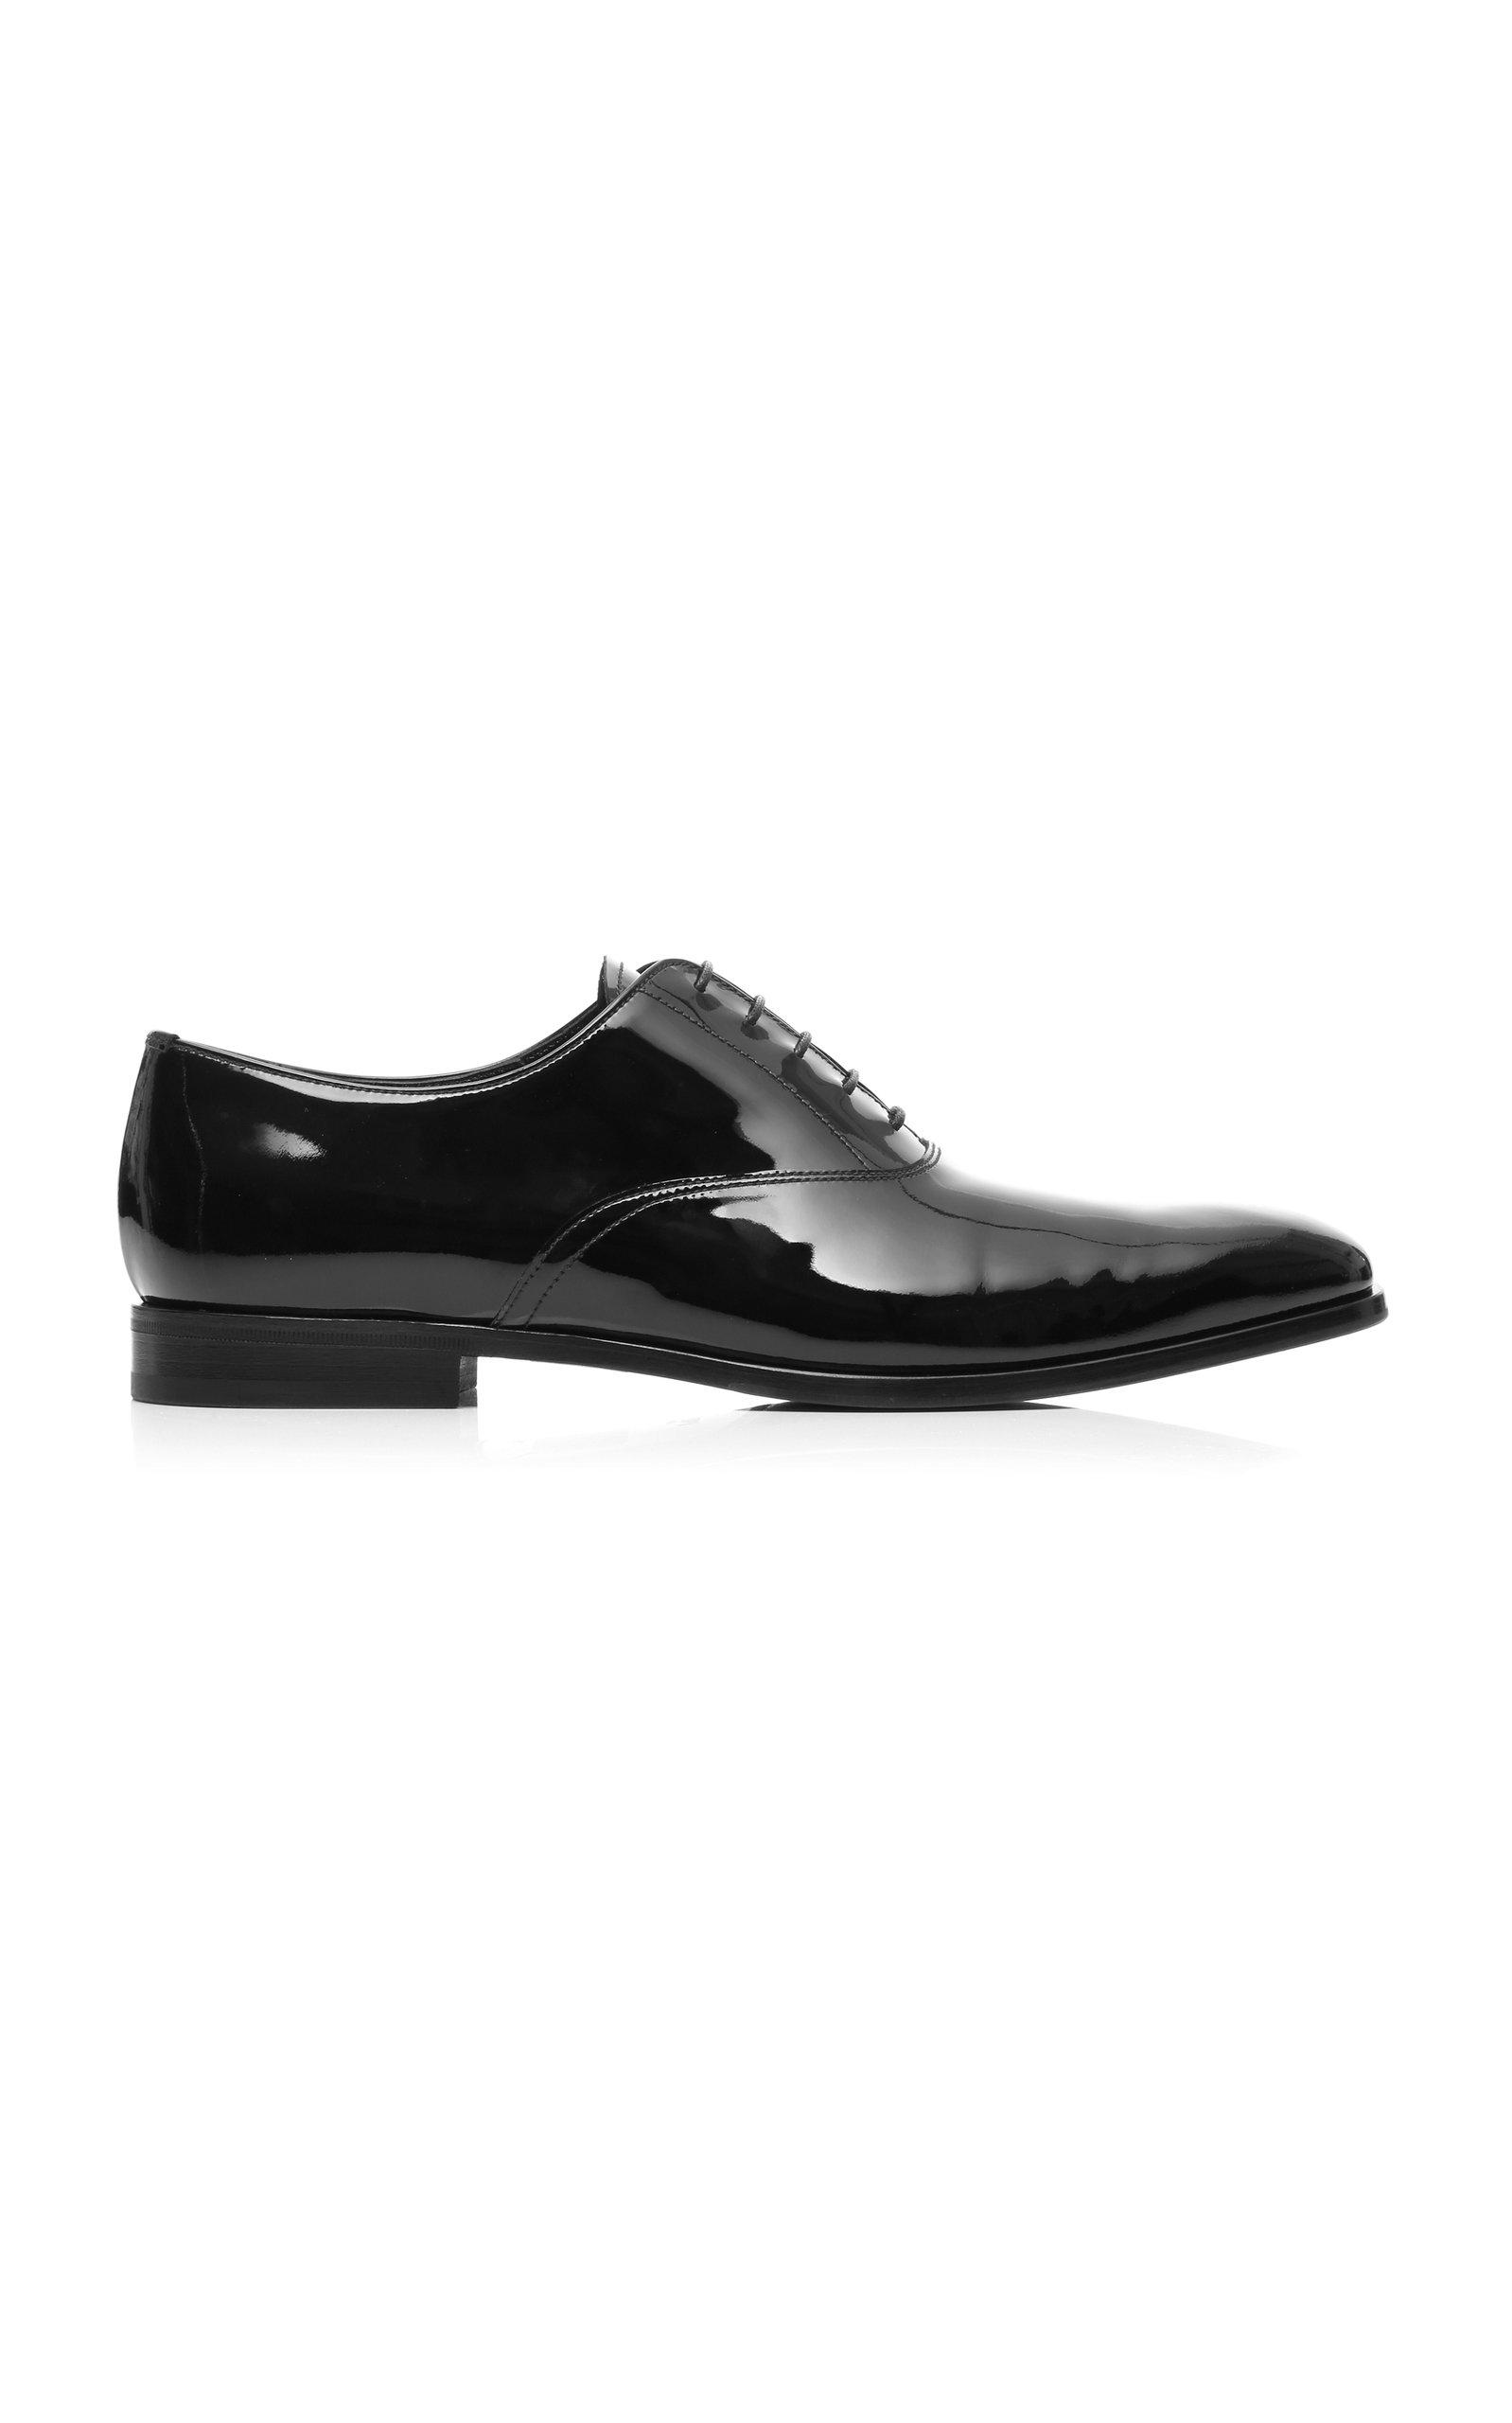 5d2491ef Patent Leather Tuxedo Shoes